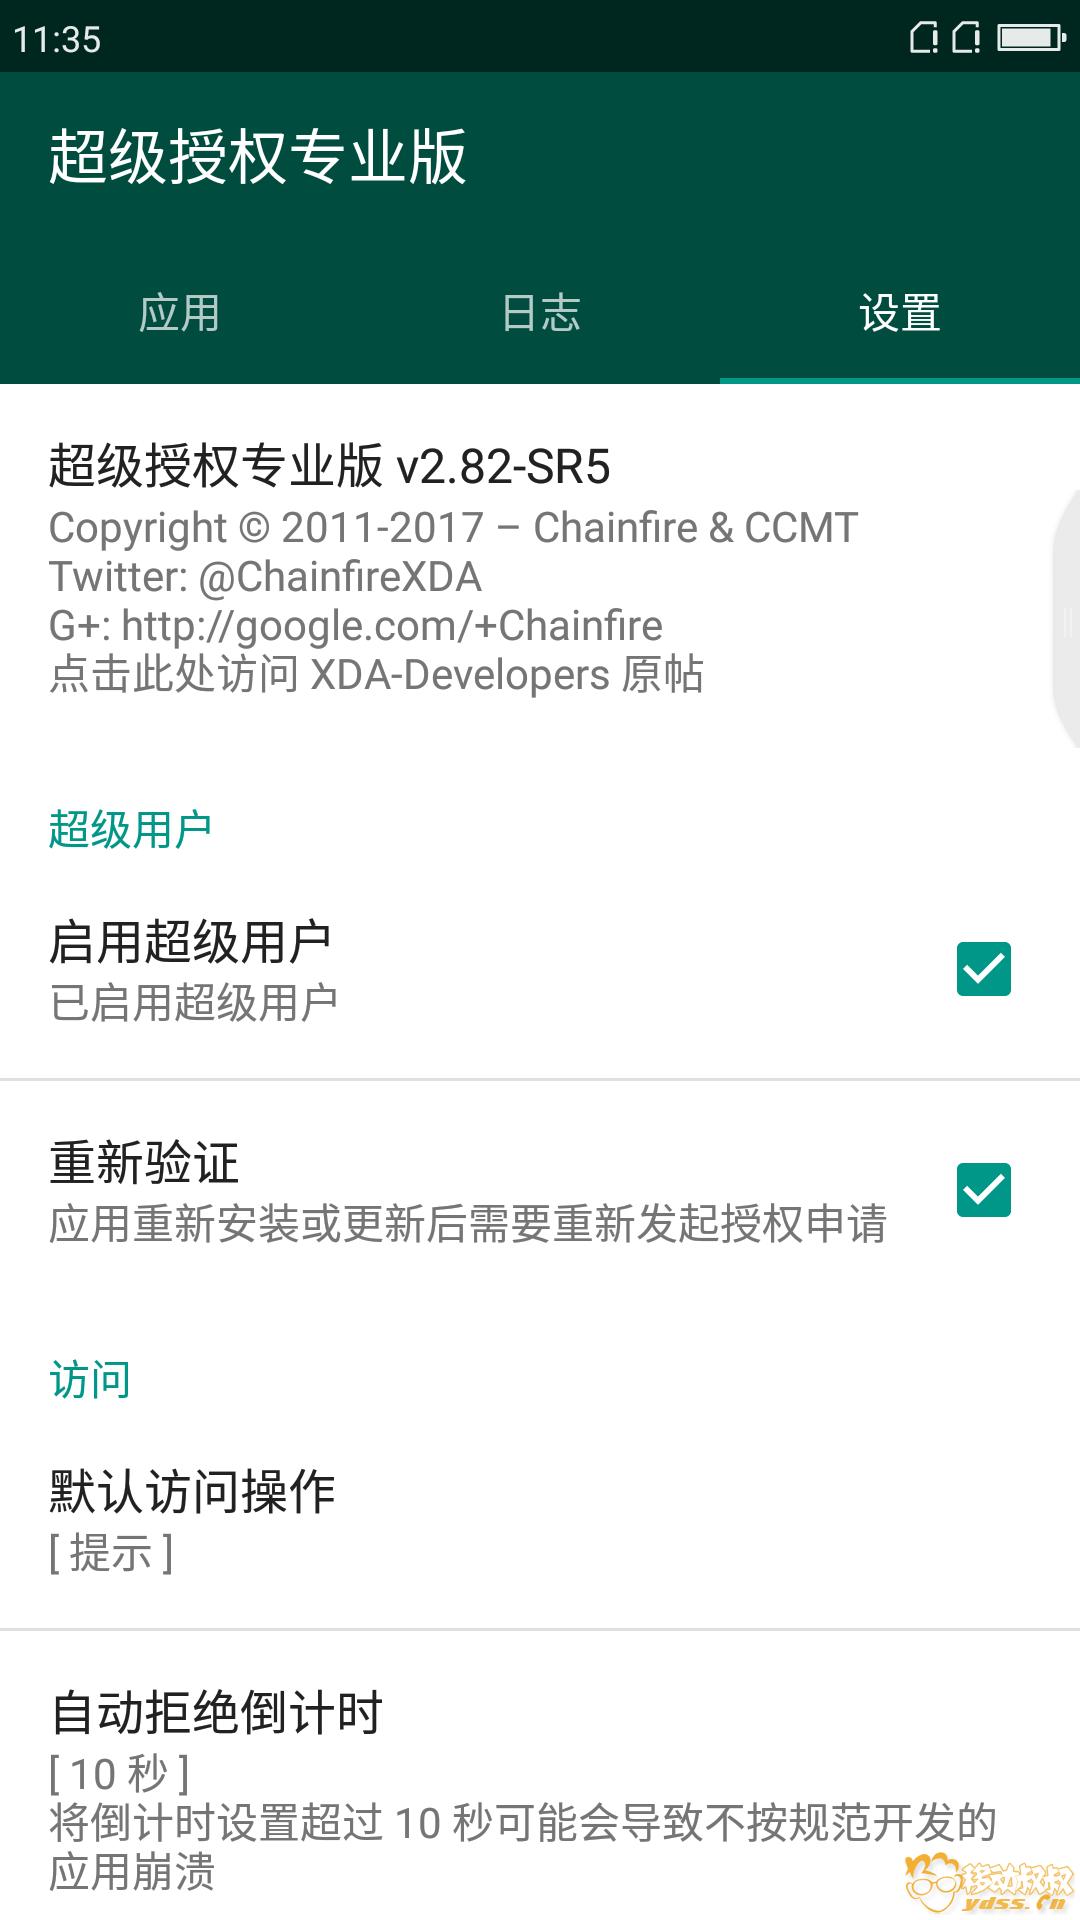 Screenshot_2018-01-27-11-35-17.png